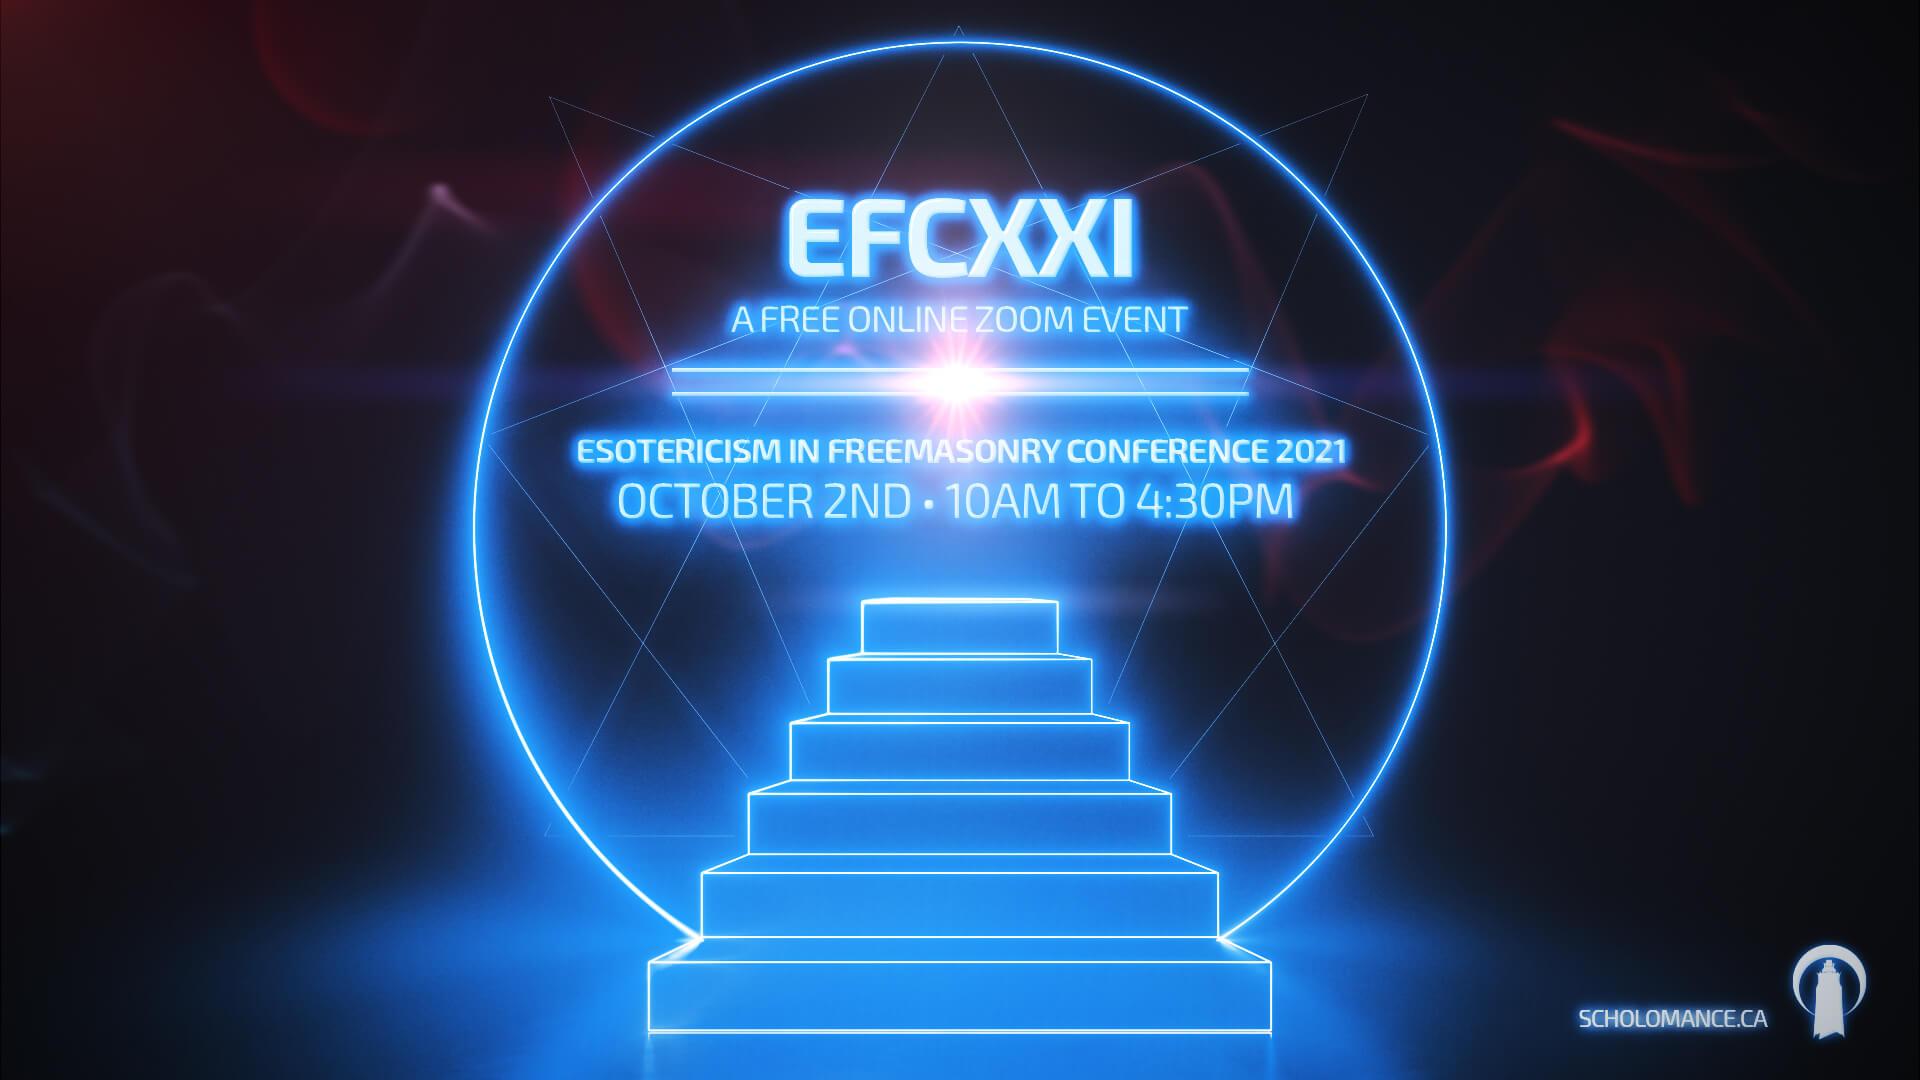 Esoteric freemasonry conference 2021 poster